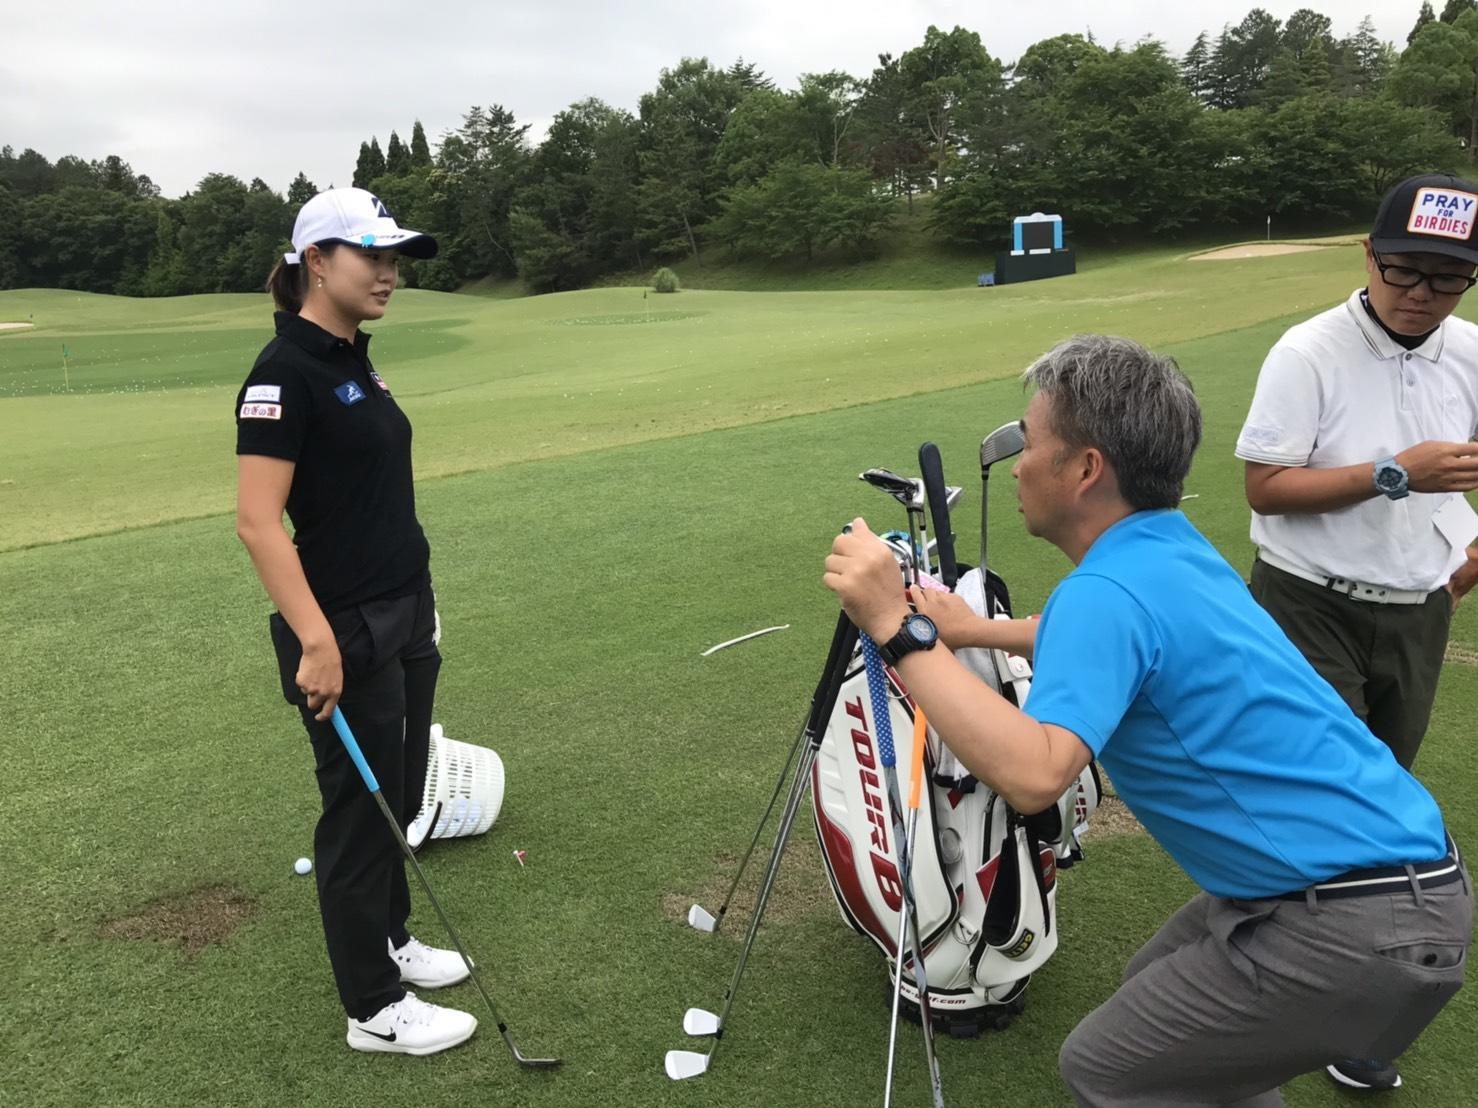 https://www.bs-golf.com/pro/ea042fcef08c780b1585e08db342ac915a6f054a.JPG